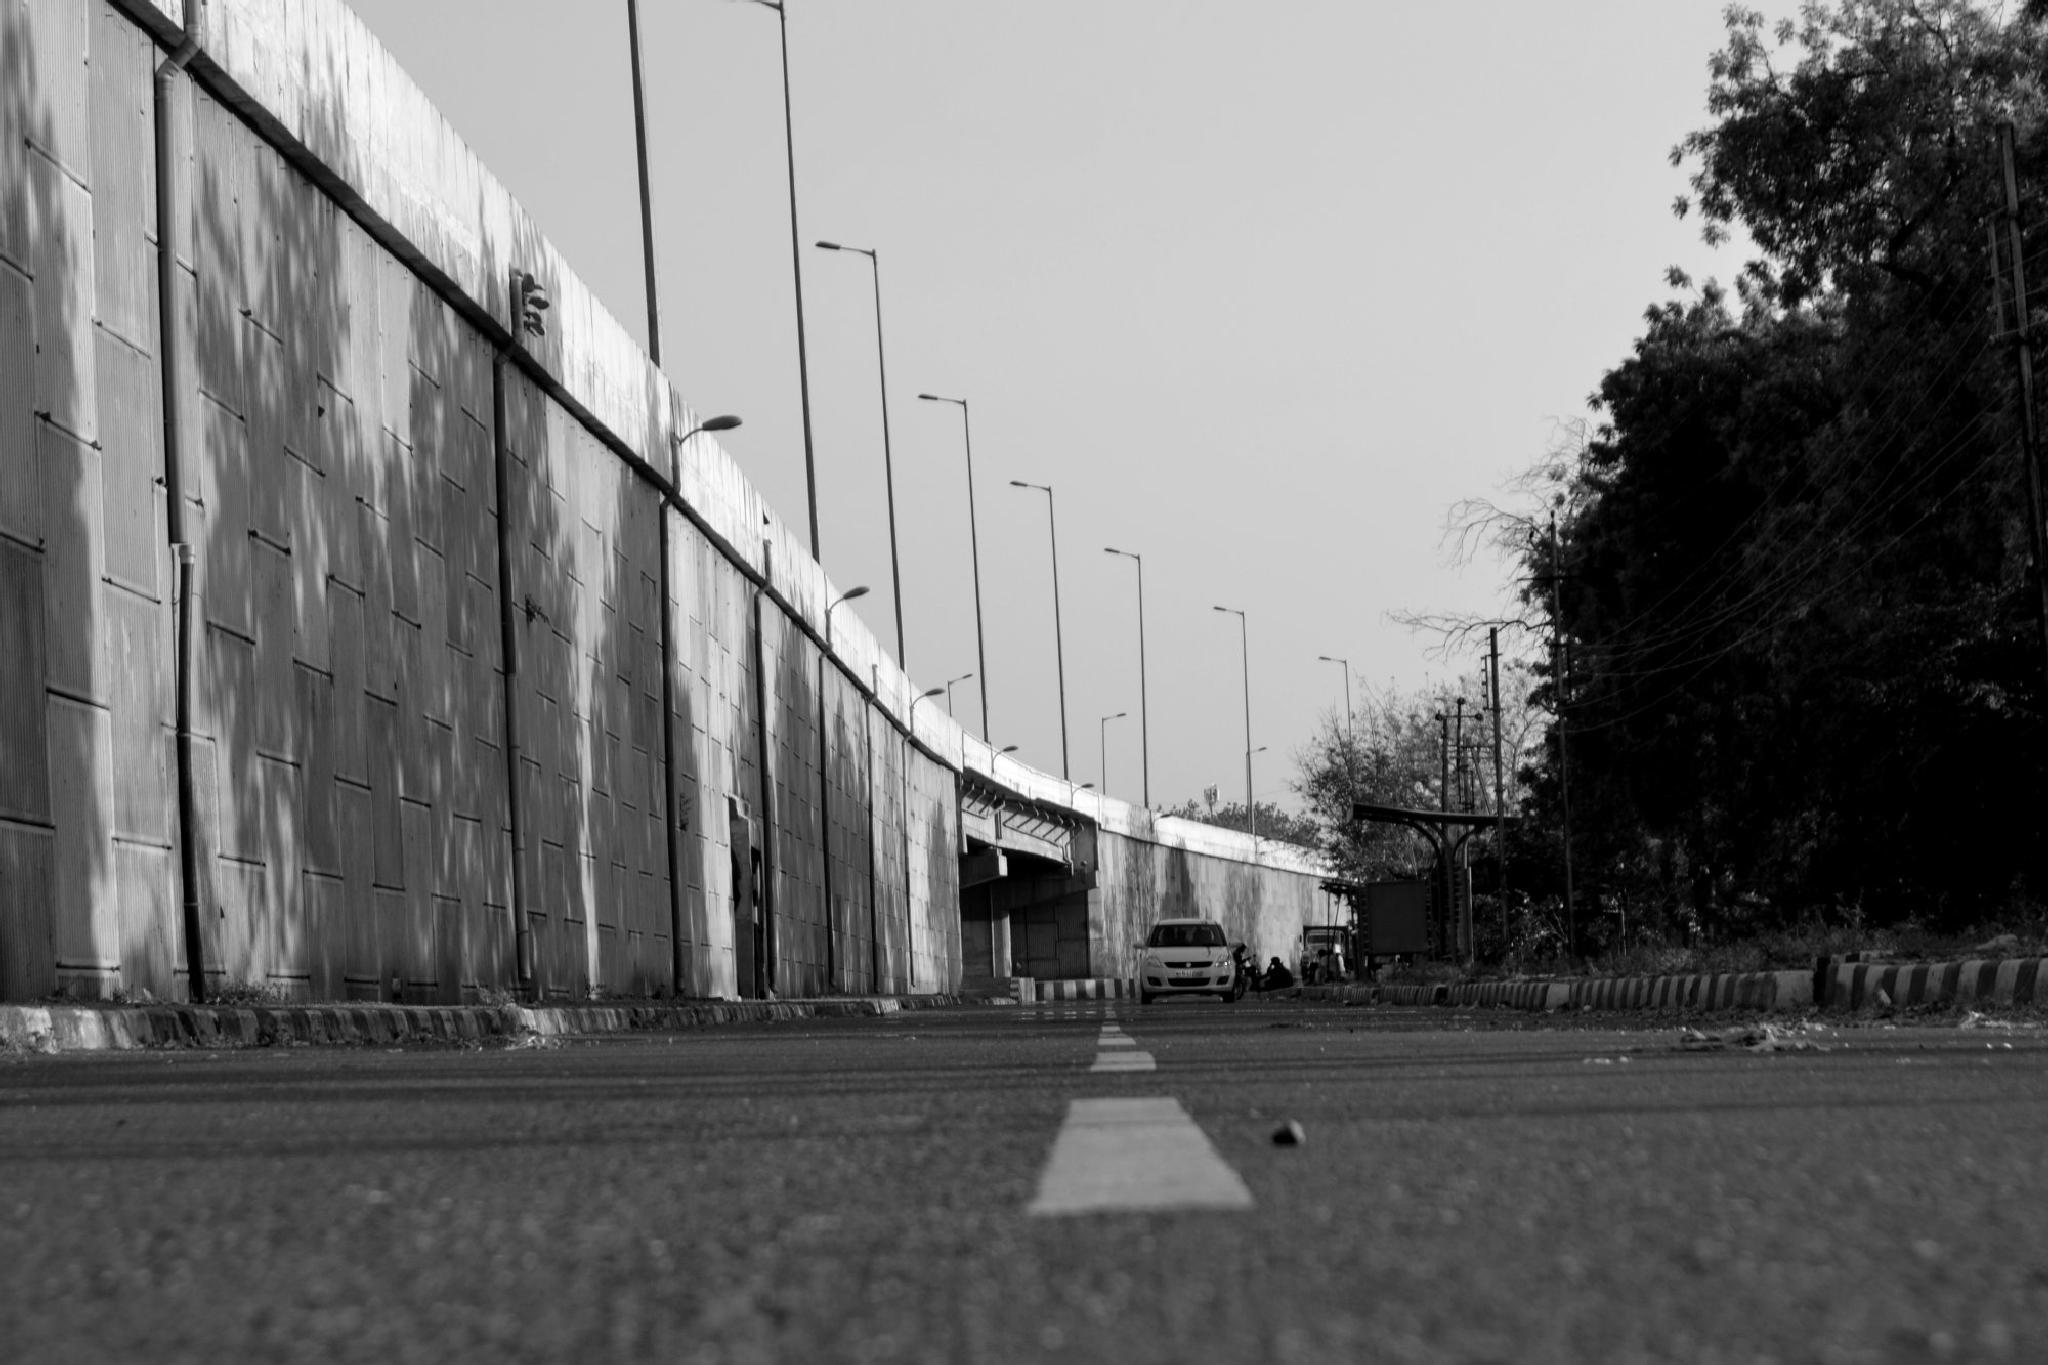 Highway Rules  by PRasad Ahirrao